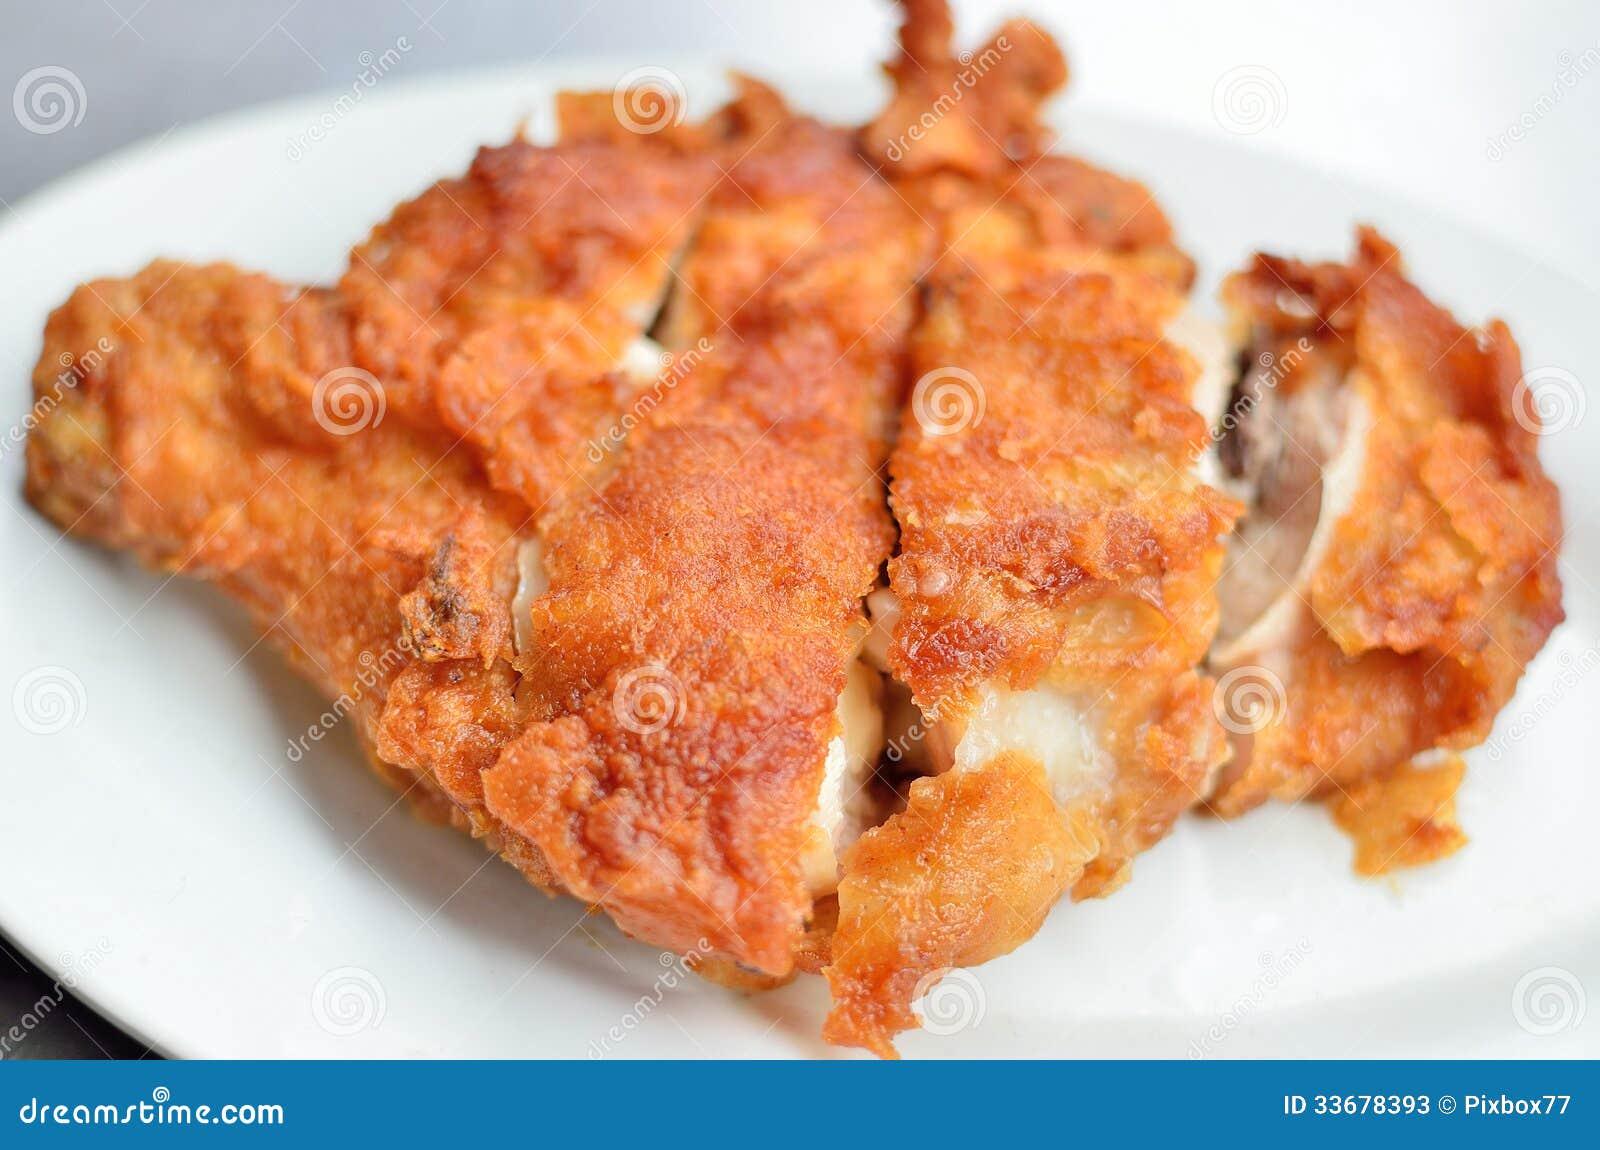 Kentucky Fried Chicken Franchises